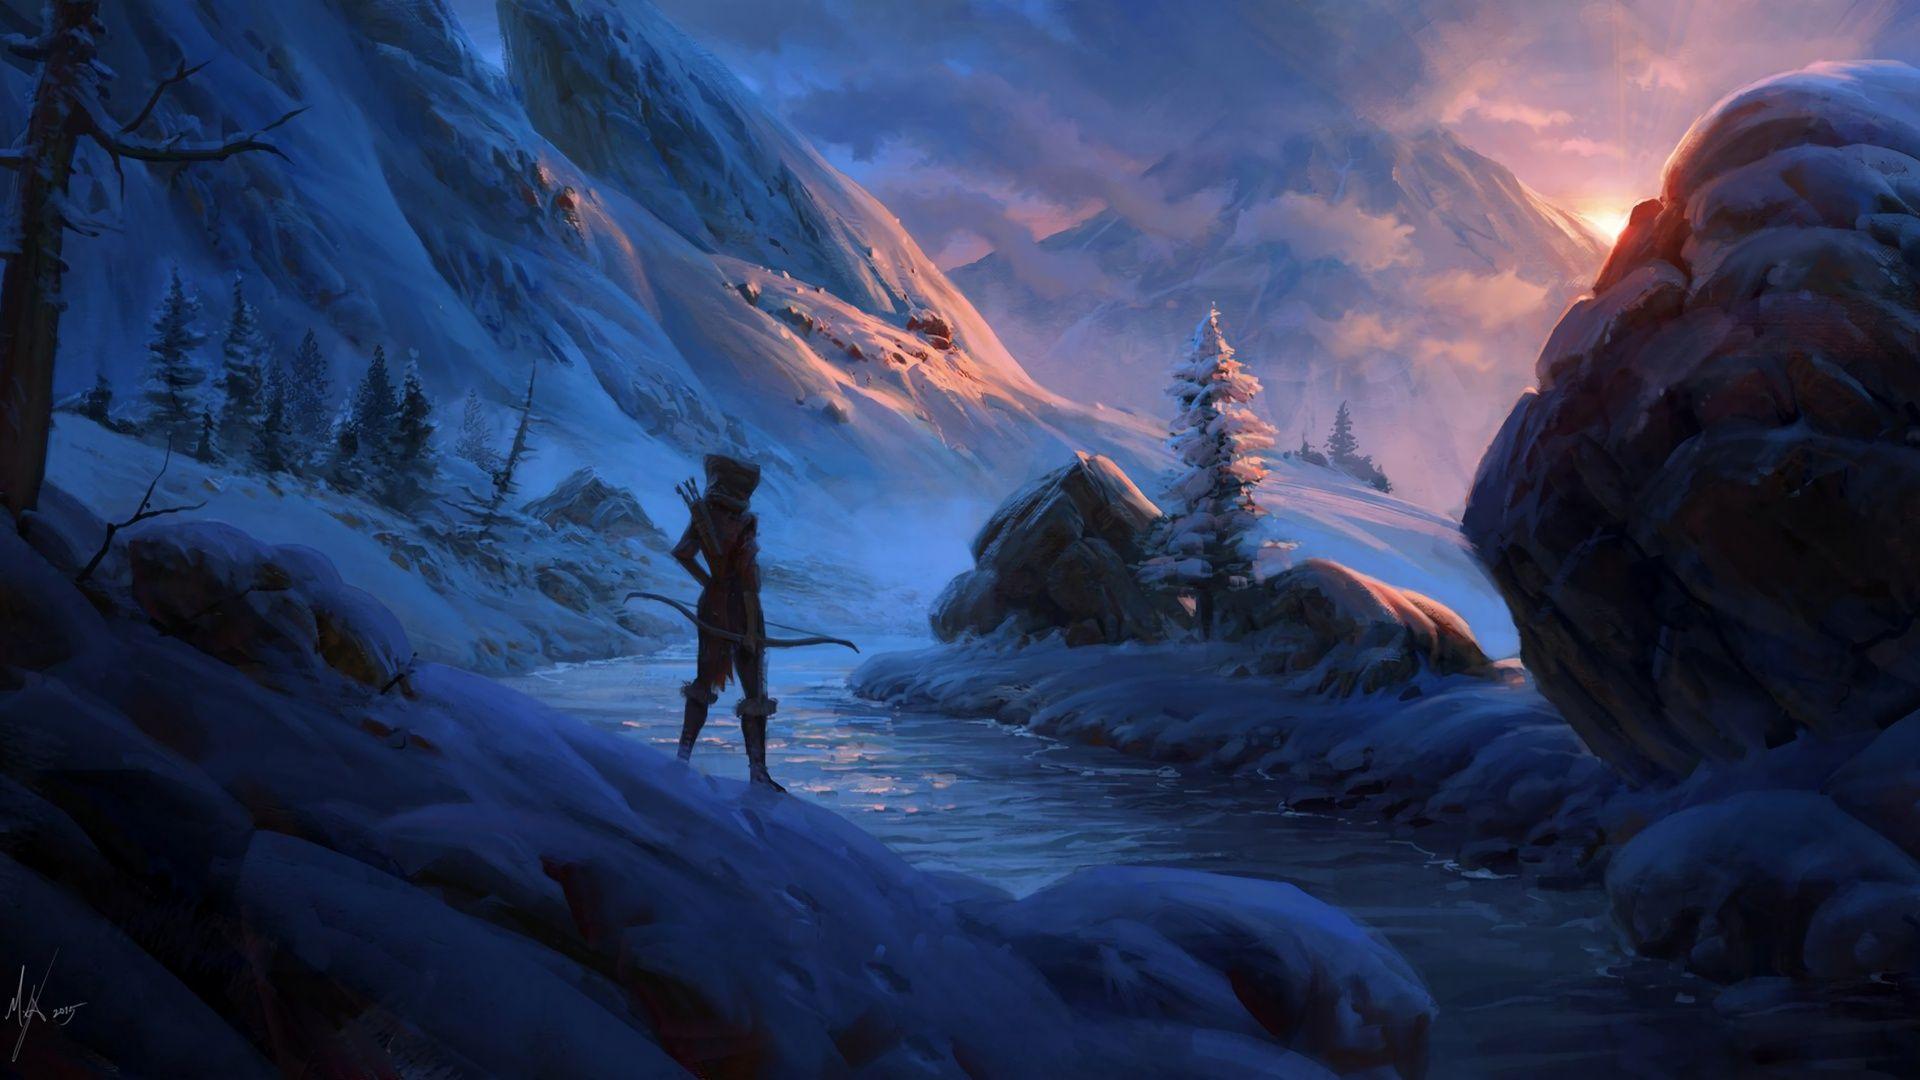 Download Wallpaper Snow Sunset Mountains Stream Stones